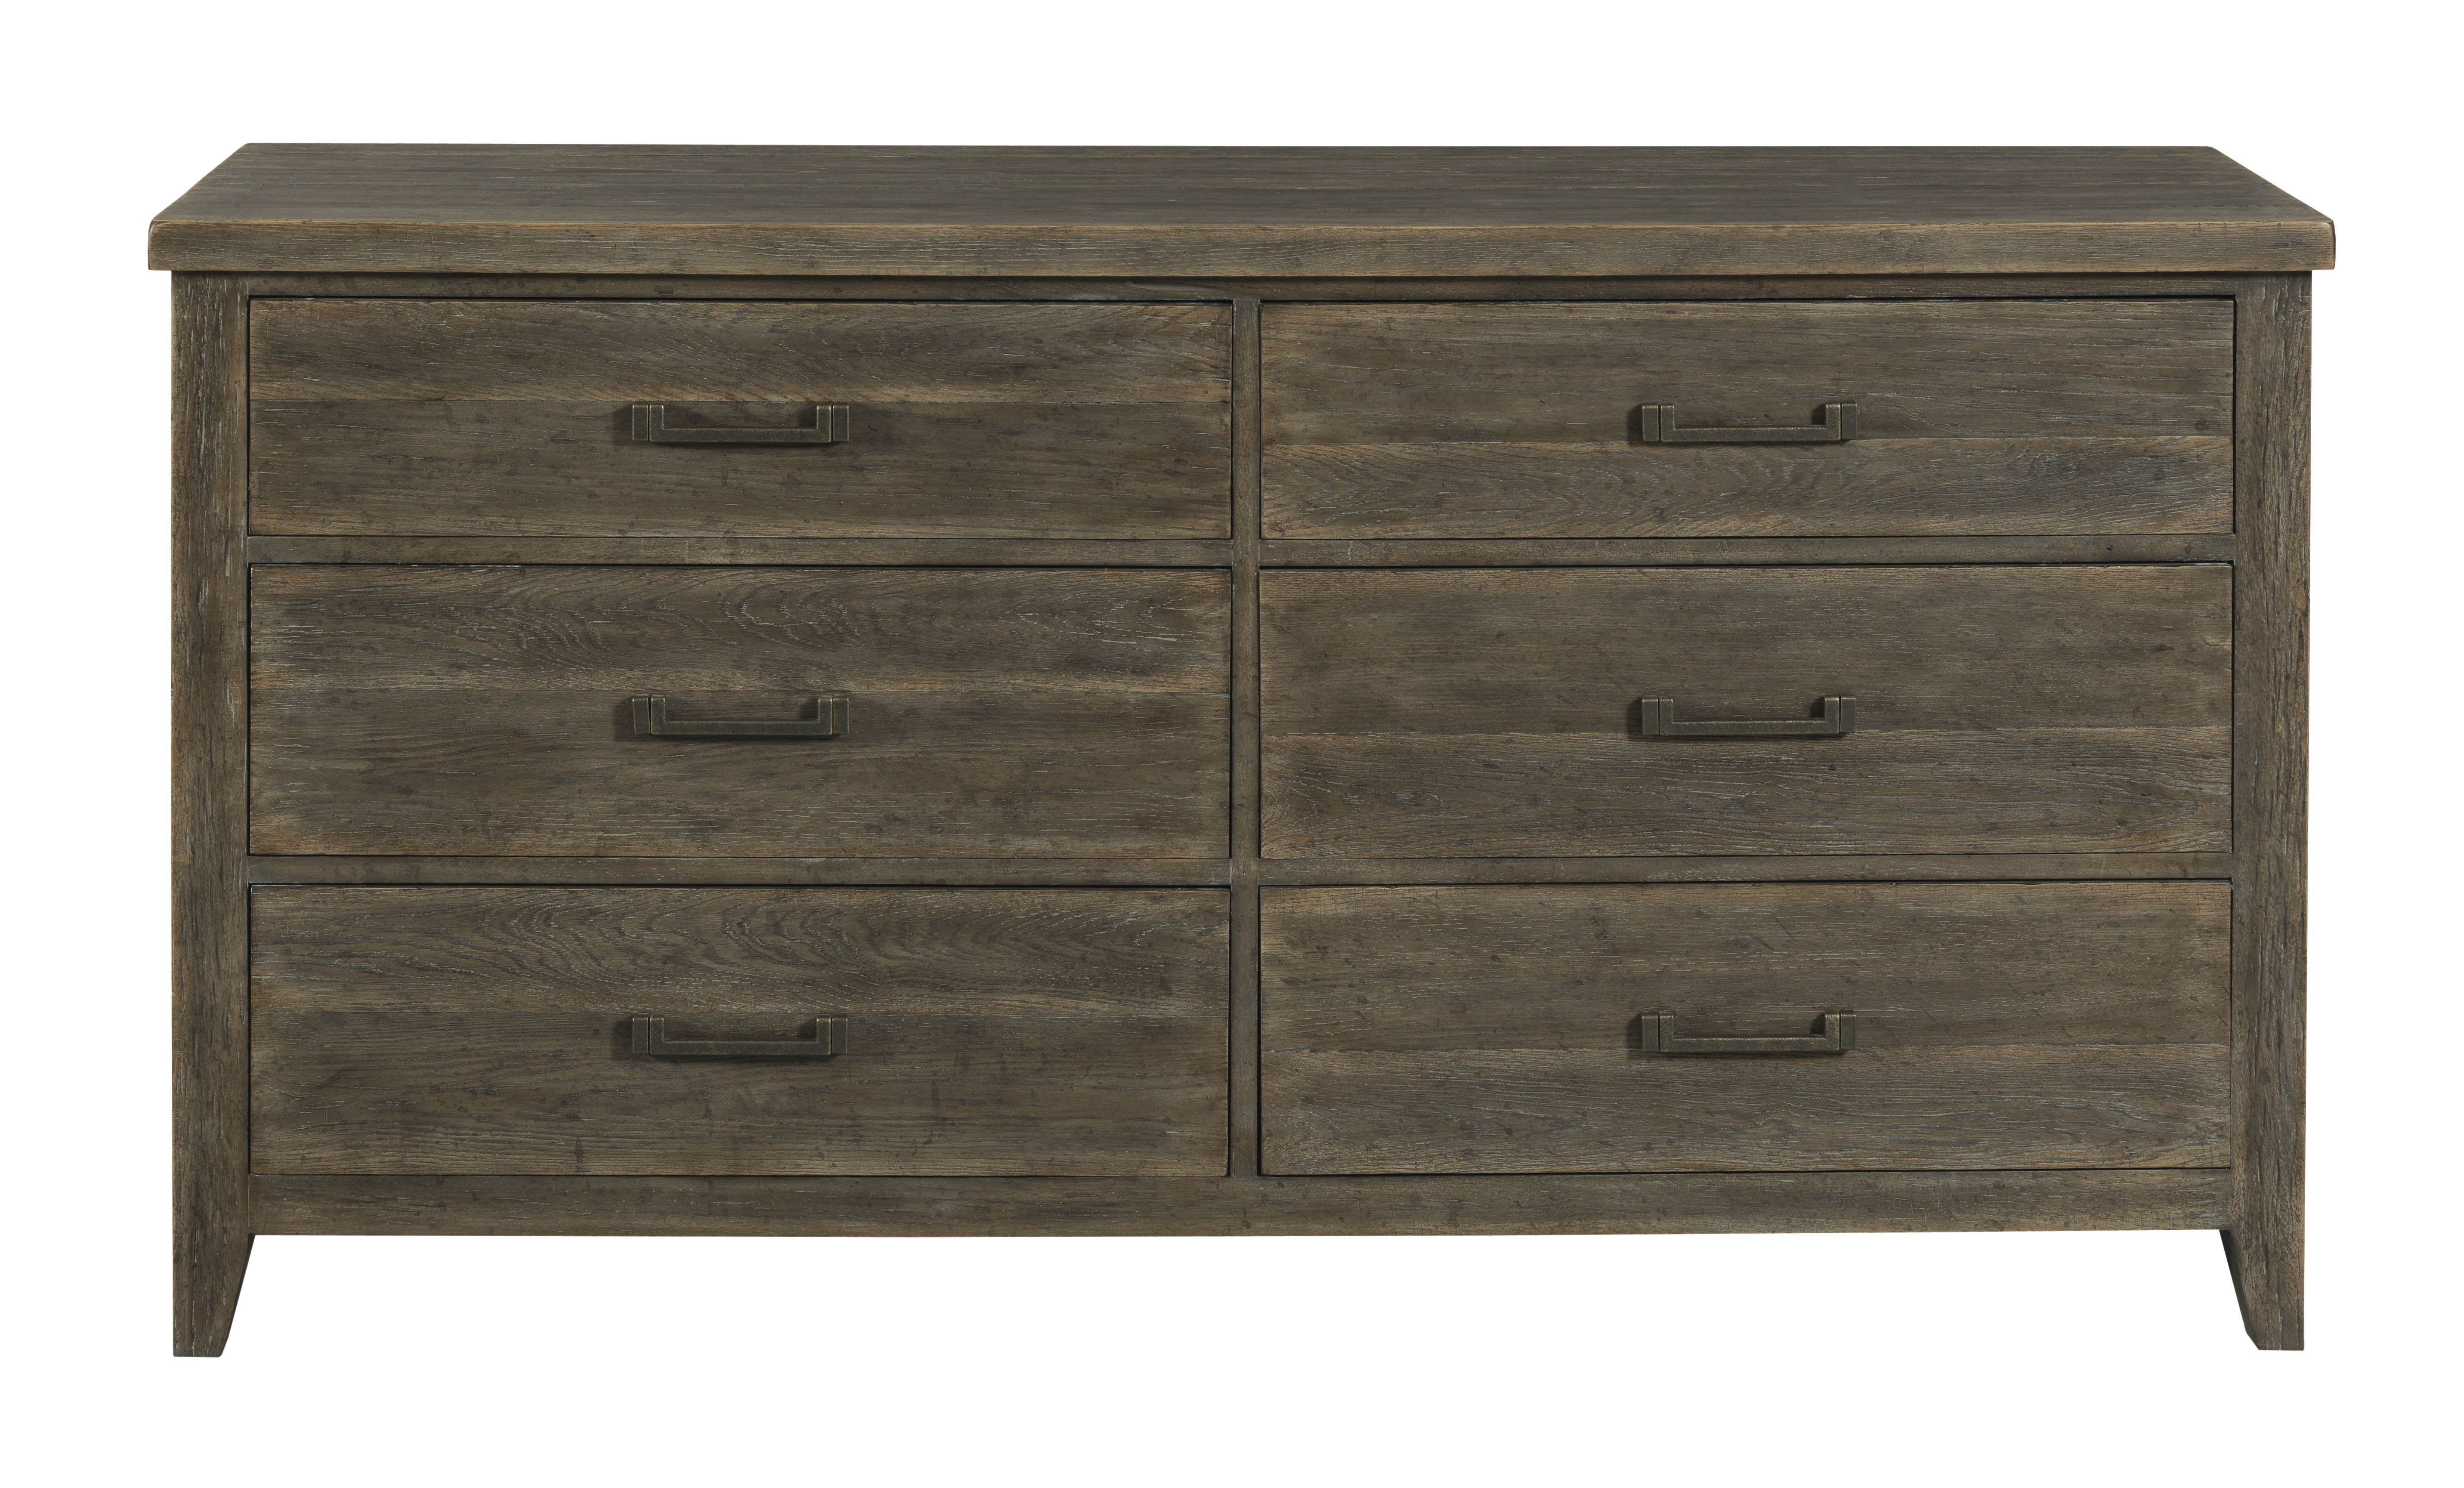 Emporium Dresser by American Drew at Jacksonville Furniture Mart